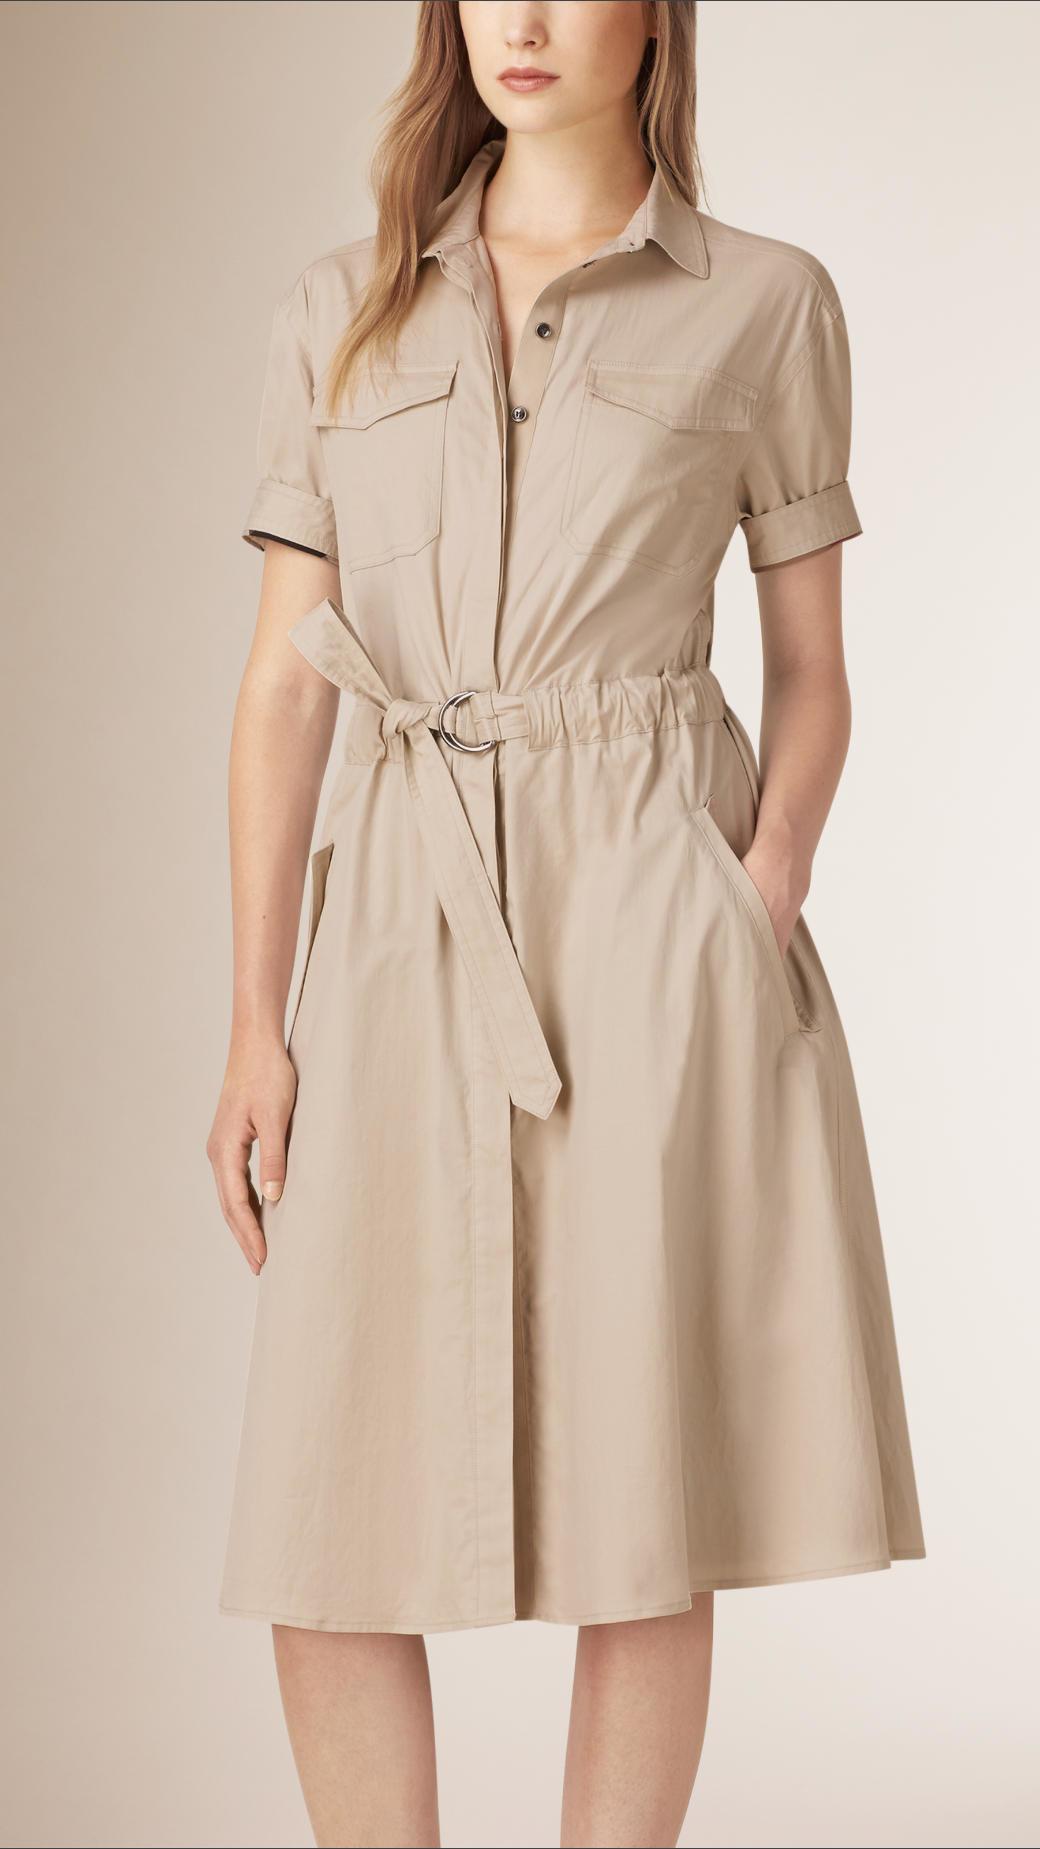 d4562e13f48b Lyst - Burberry Cotton Military Shirt Dress in Gray